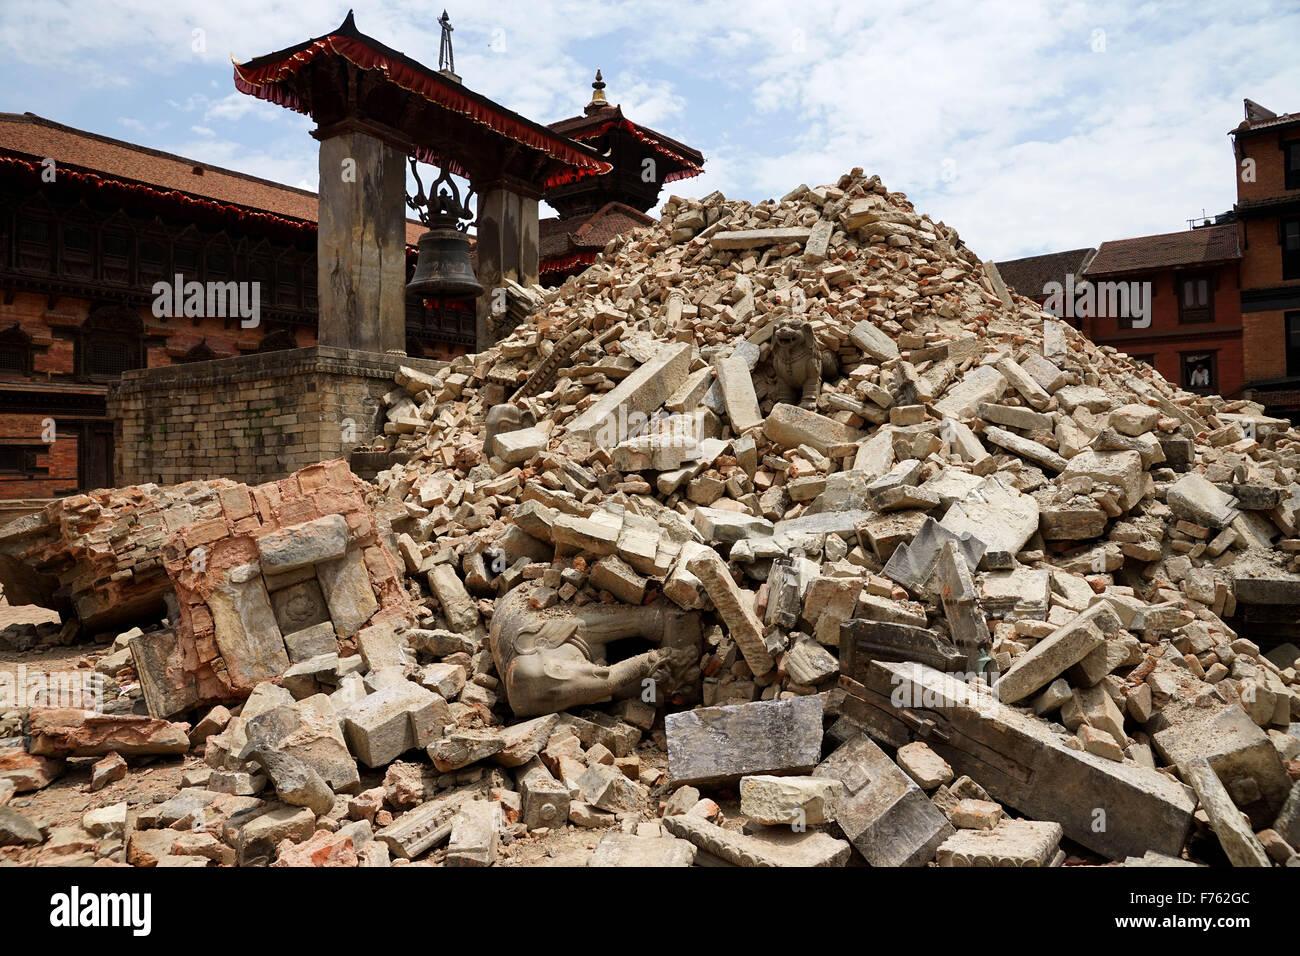 Temple destroyed, earthquake, bhaktapur, kathmandu, nepal, asia - Stock Image